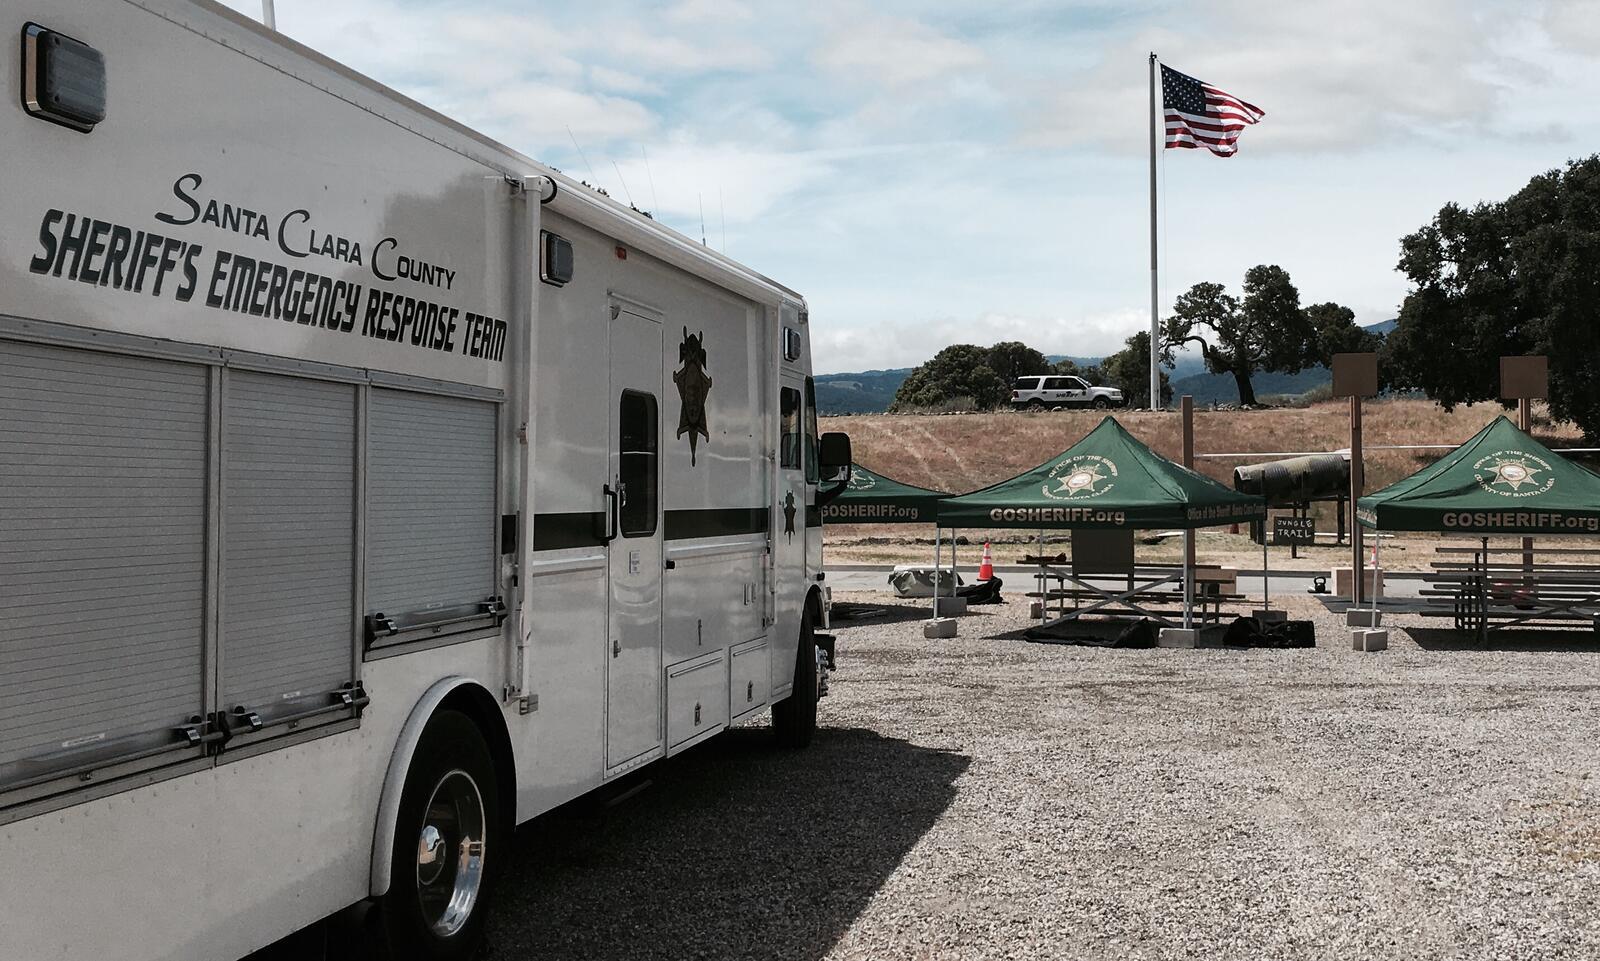 Santa Clara County Sheriff - 273 Crime and Safety updates